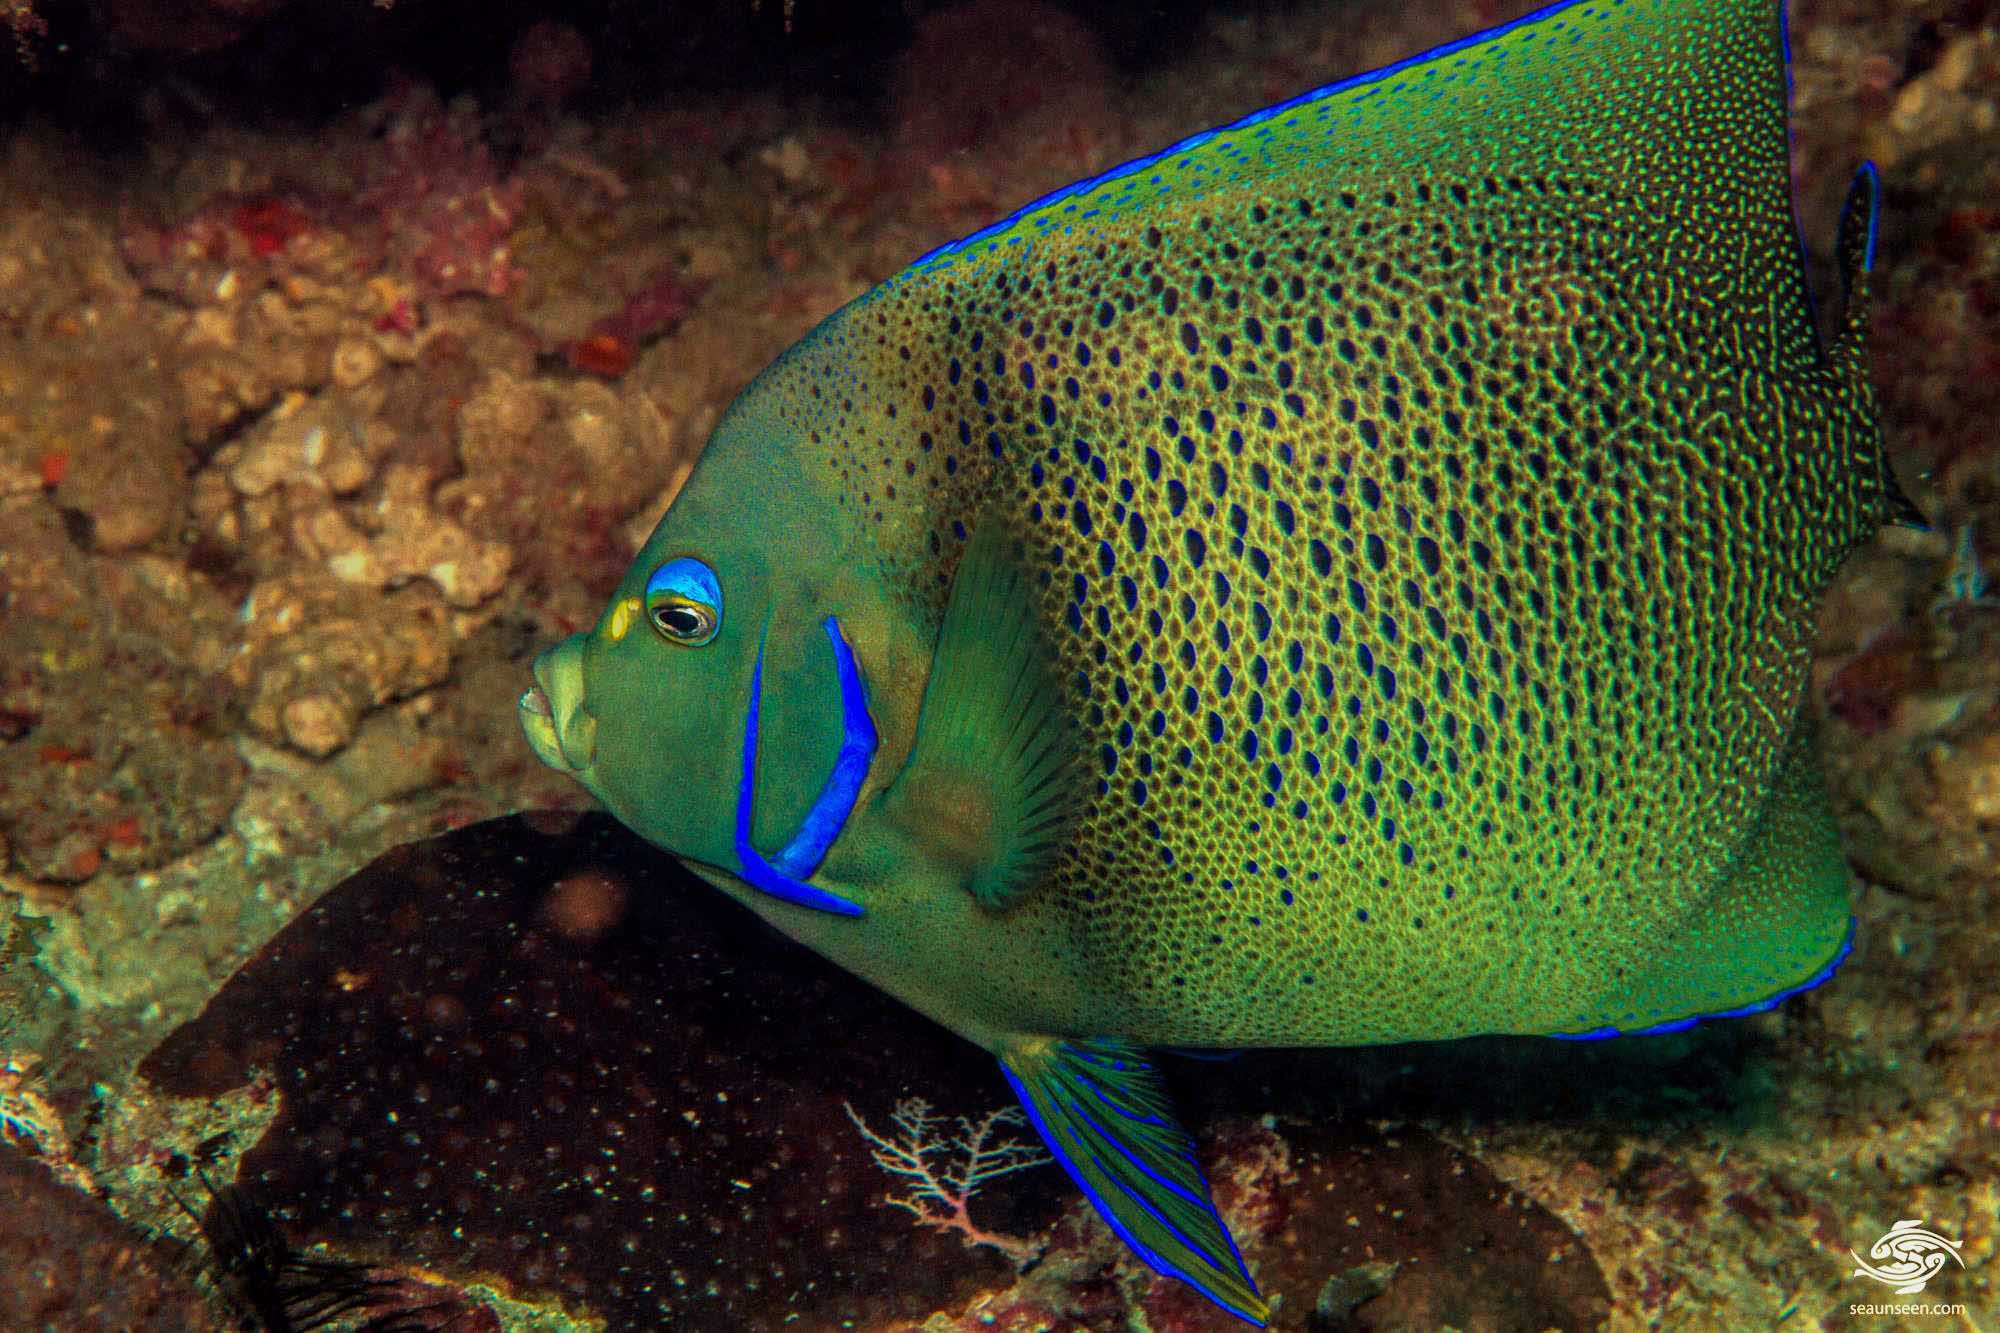 Koran angelfish (Pomacanthus semicirculatus) is also known as the Blue angelfish or Semicircle angelfish